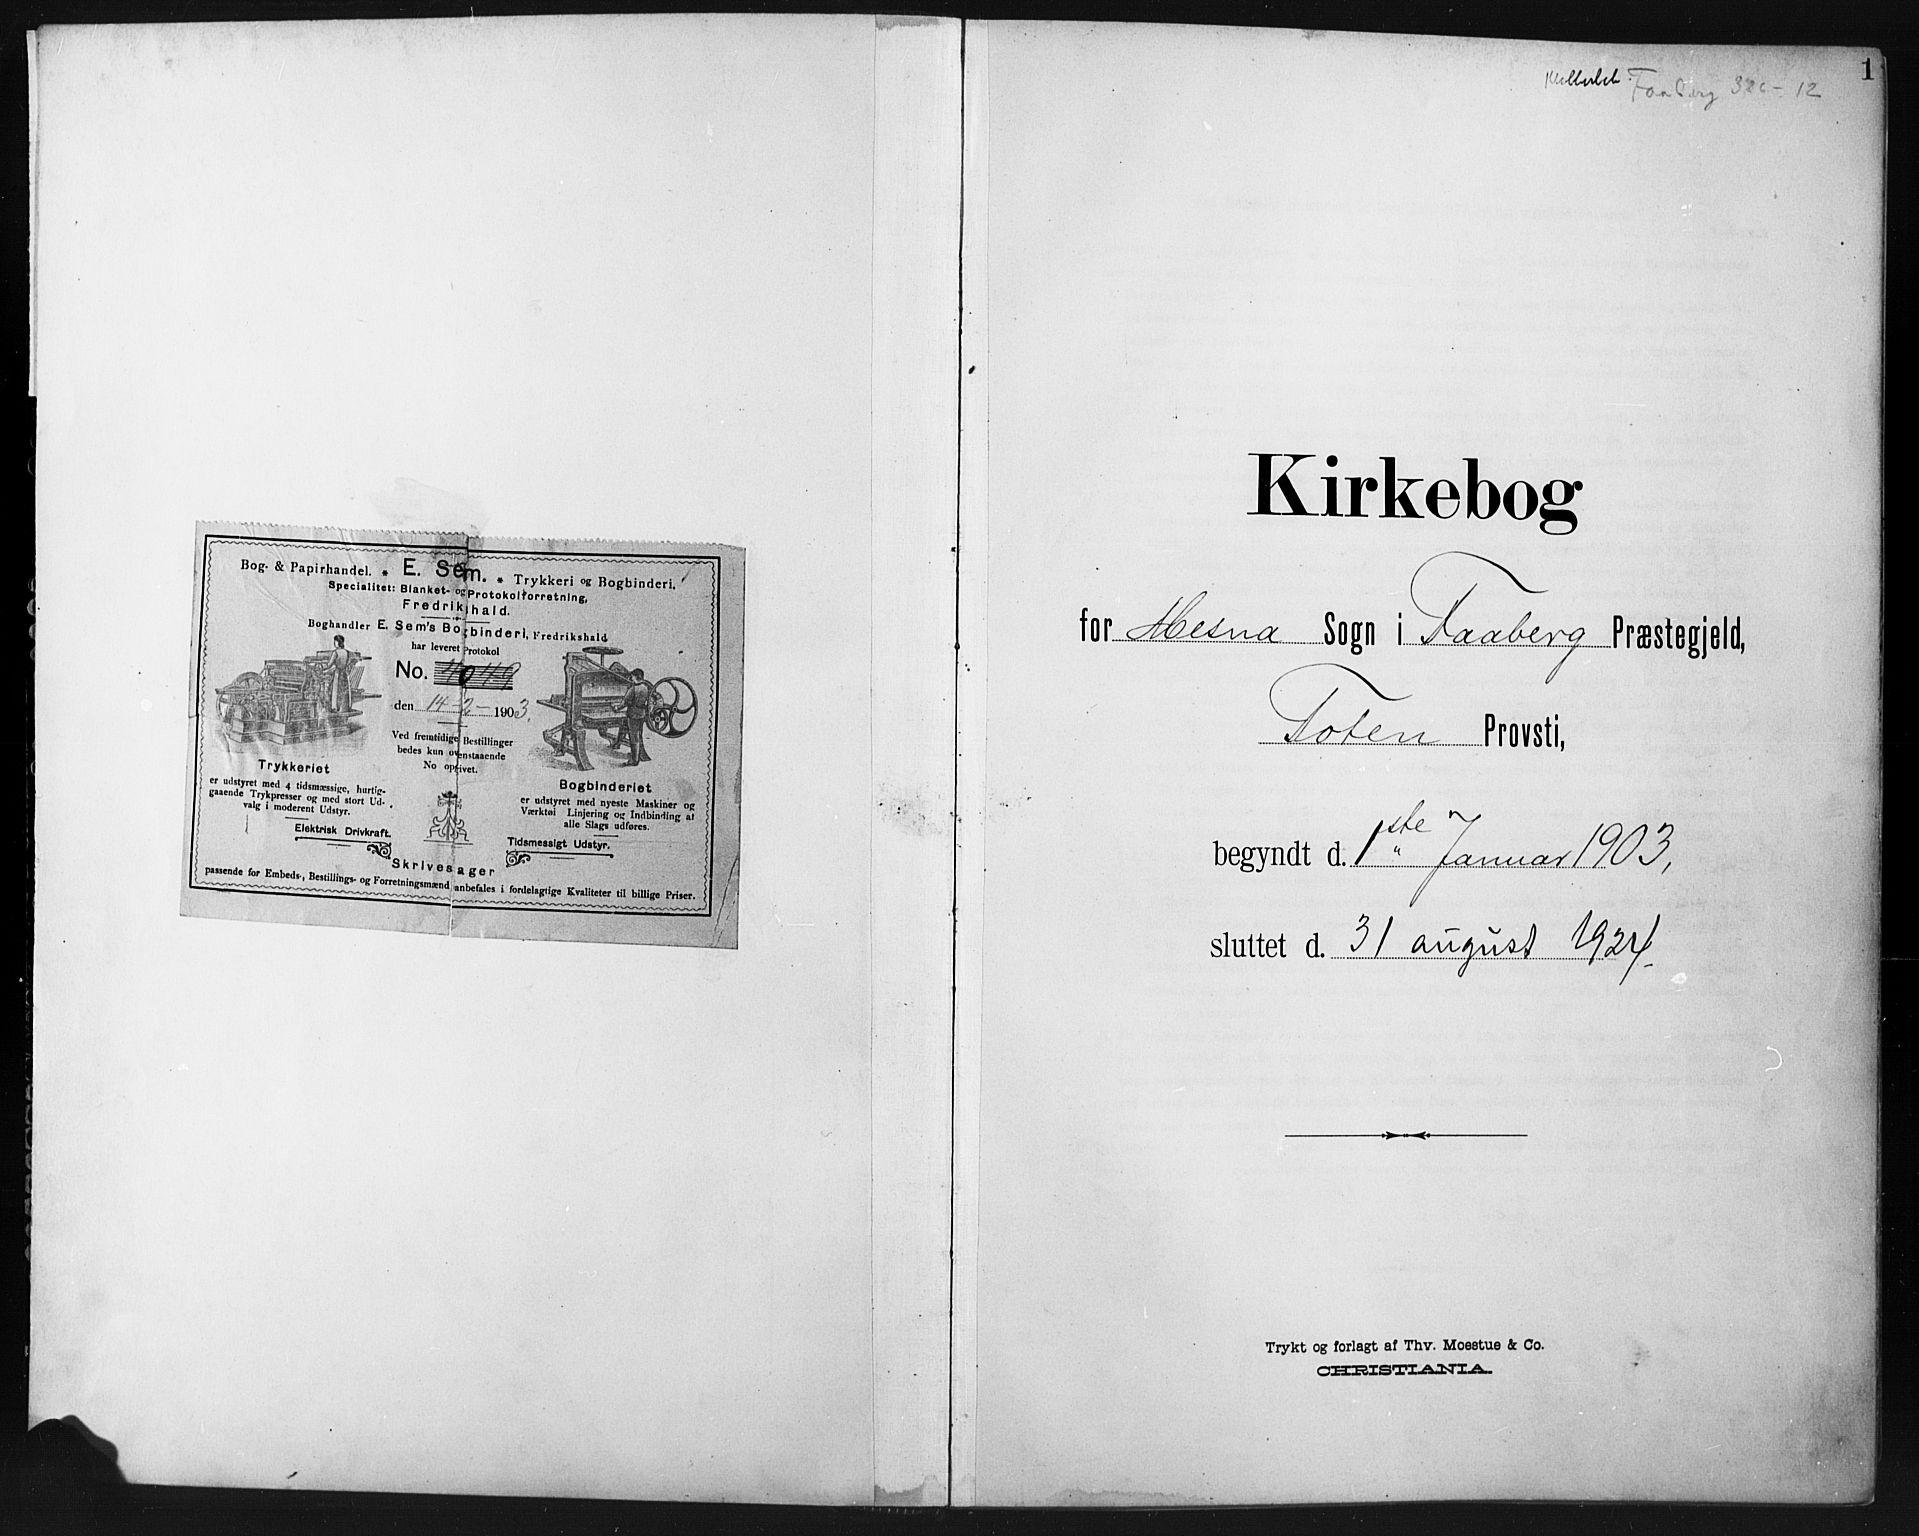 SAH, Fåberg prestekontor, Klokkerbok nr. 12, 1903-1924, s. 1